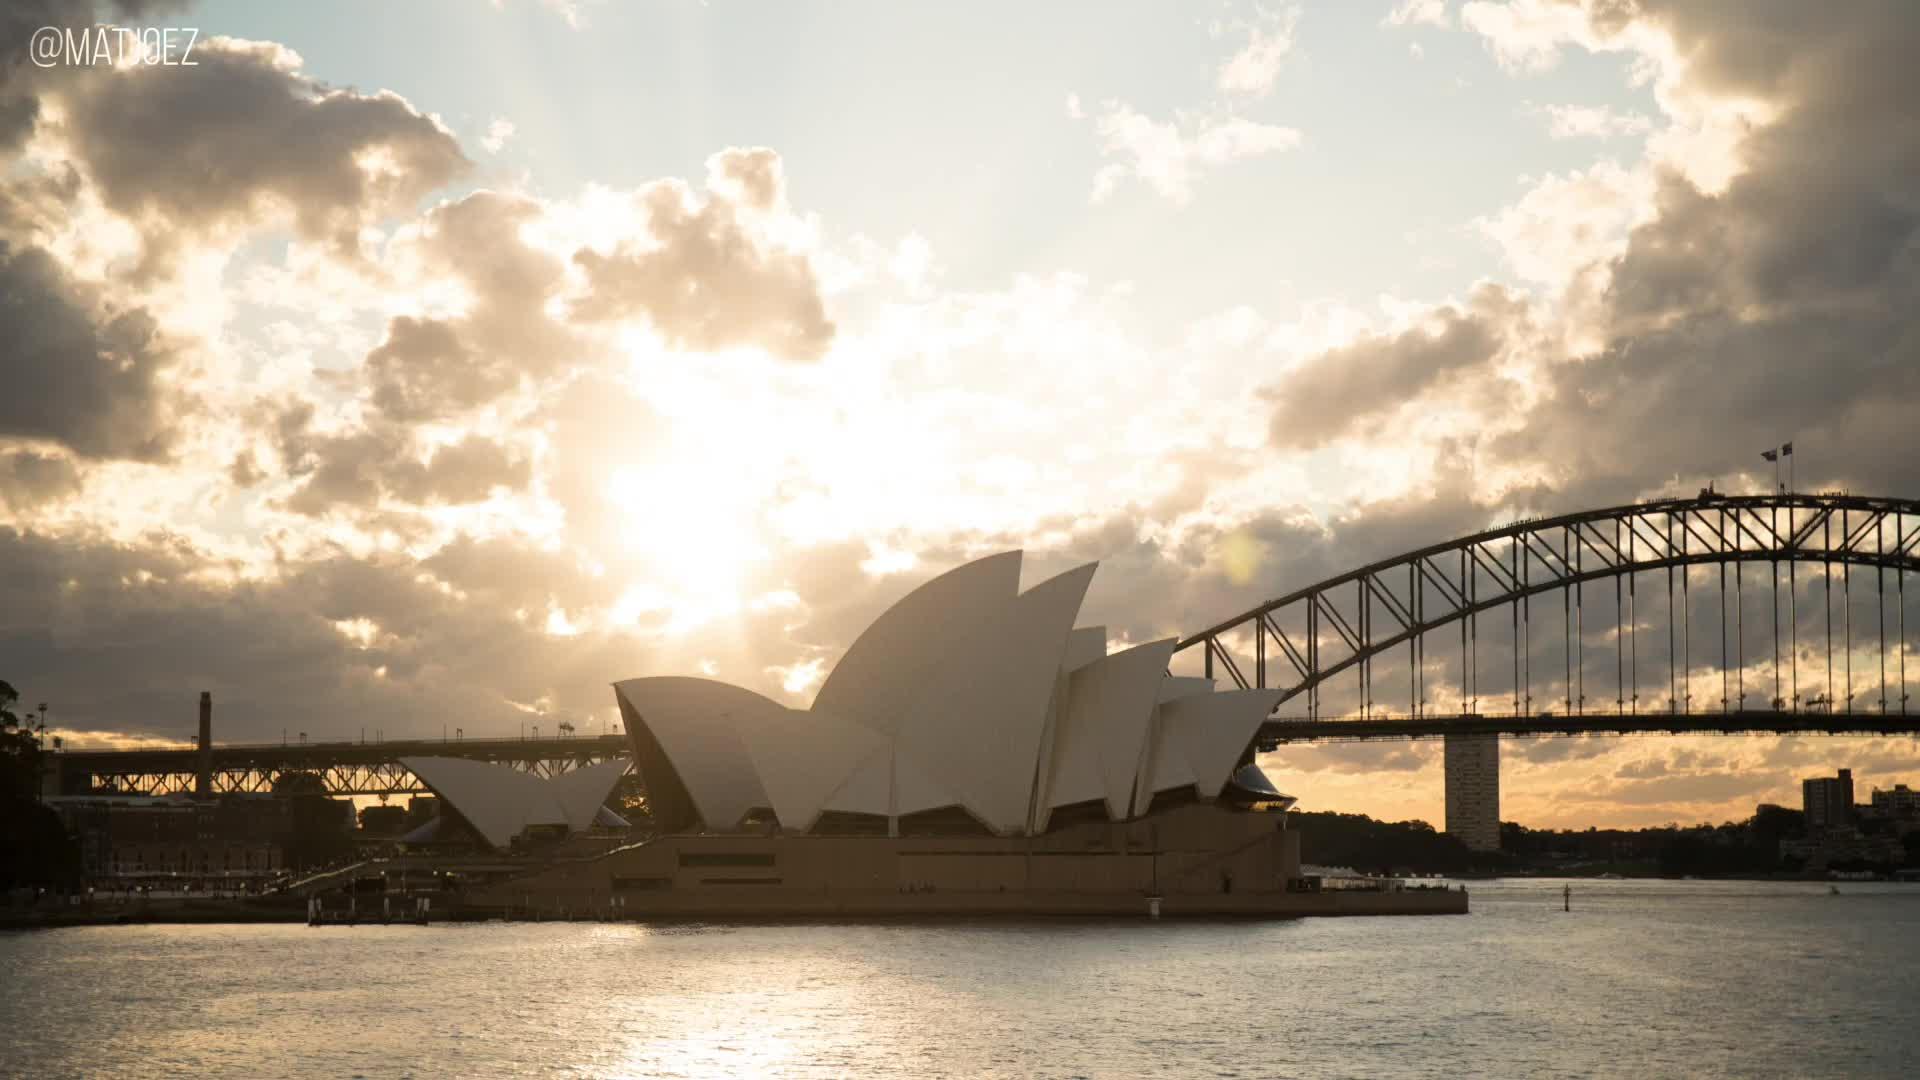 highqualitygif, matjoez, timelapse, Sydney Opera House GIFs